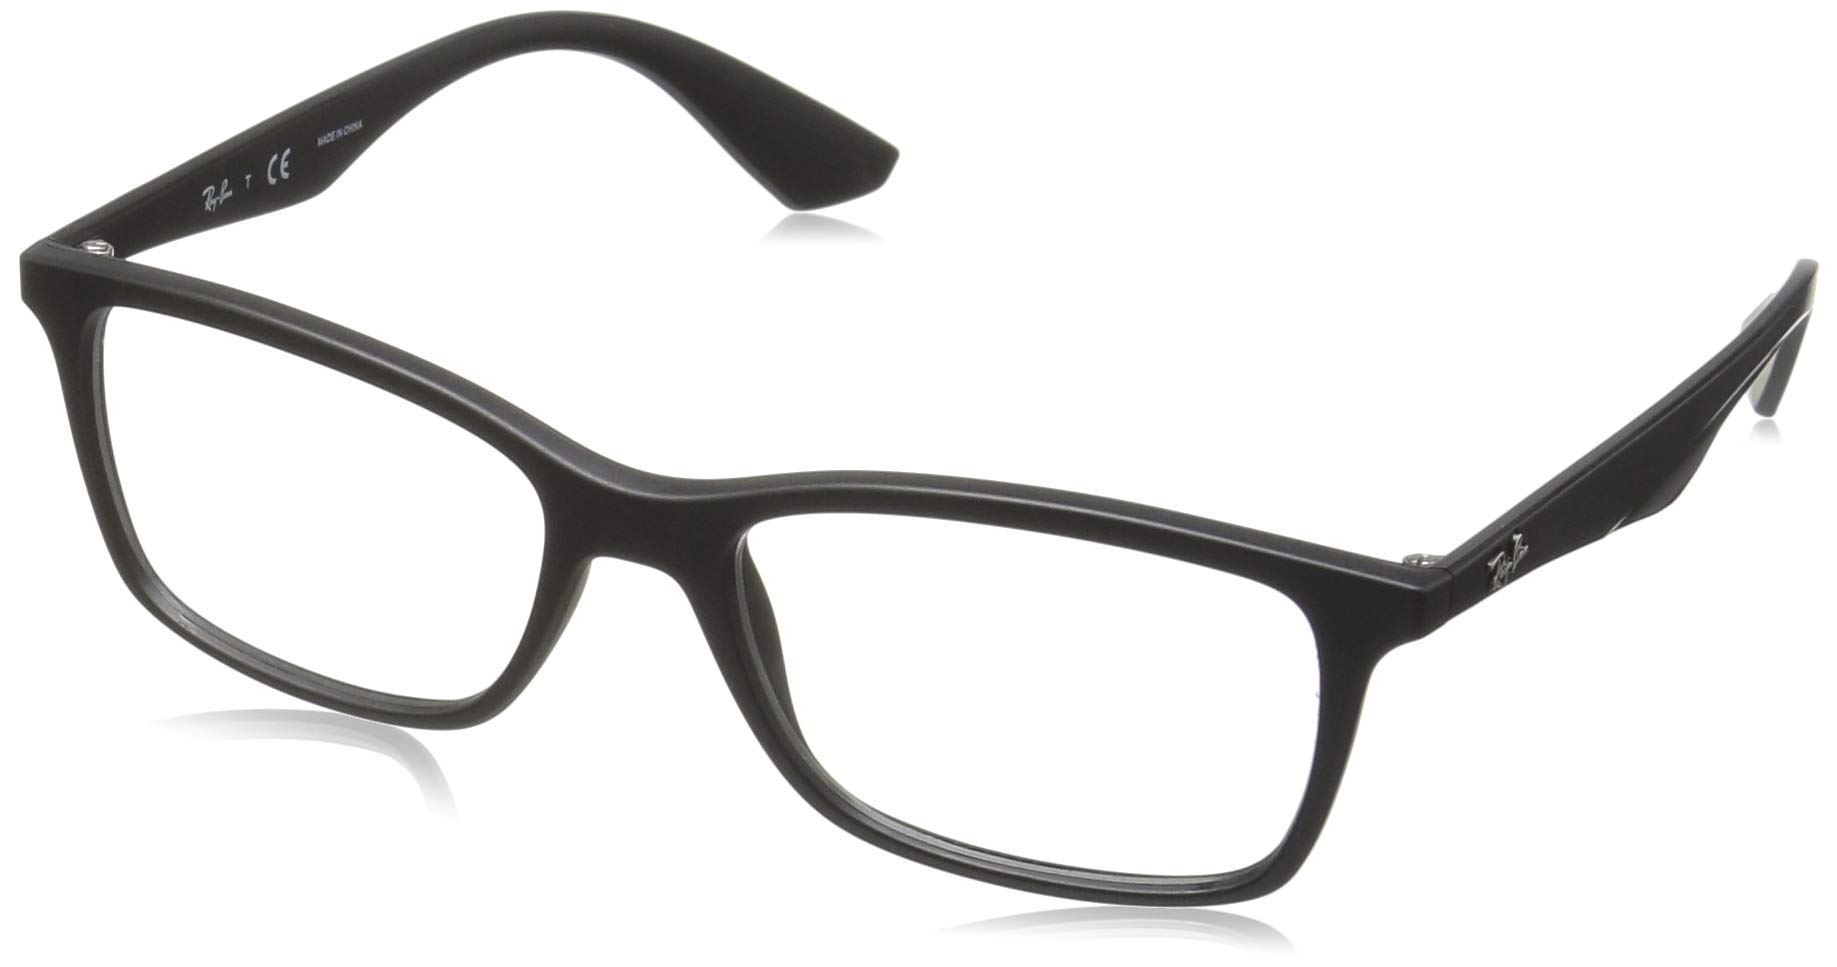 Ray-Ban RX7047 Rectangular Eyeglass Frames, Matte Black/Demo Lens, 54 mm